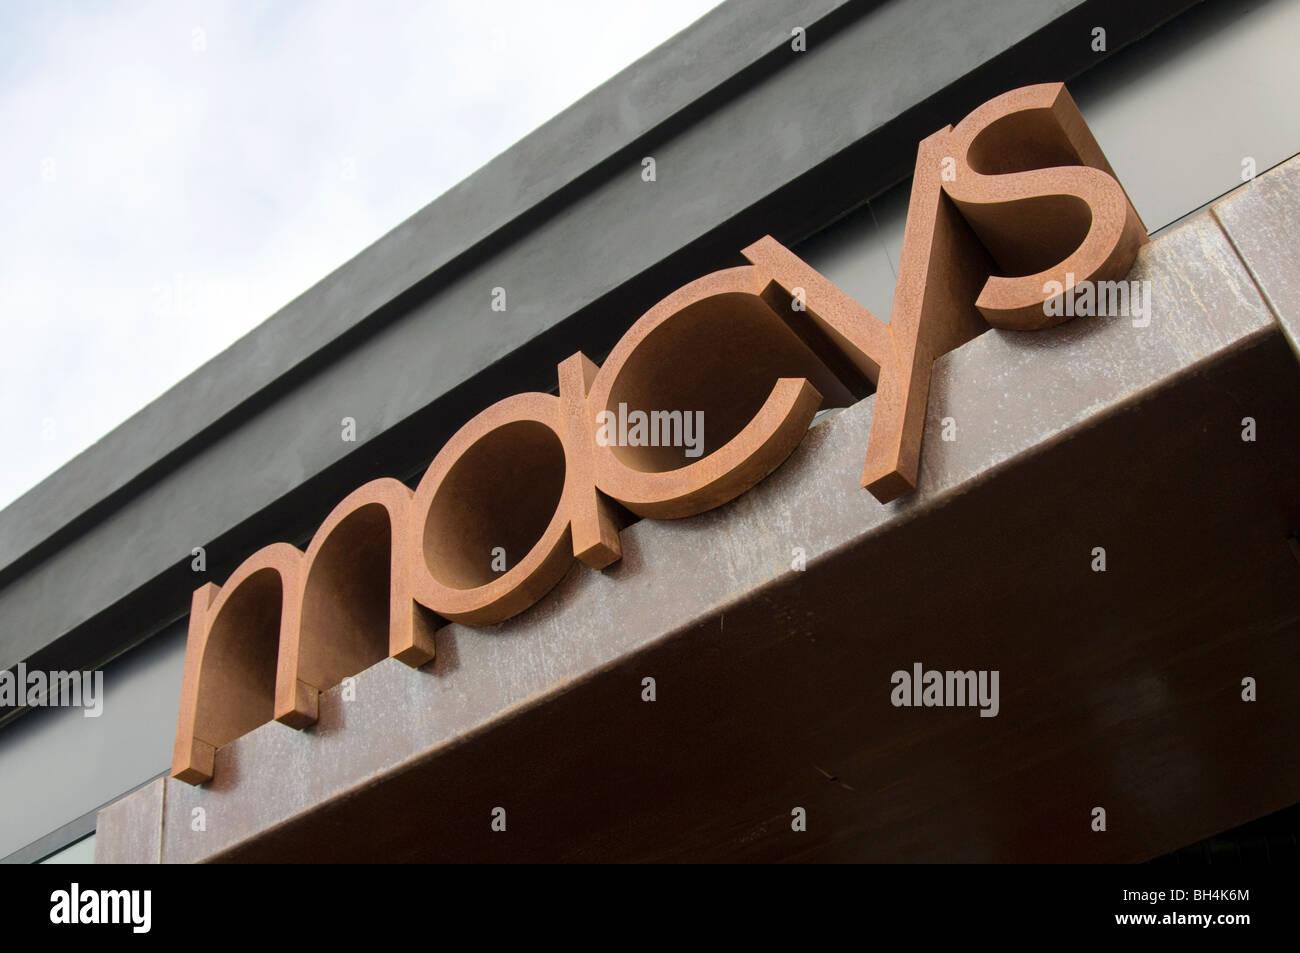 macys department store stores shop store logo brand branding brands - Stock Image